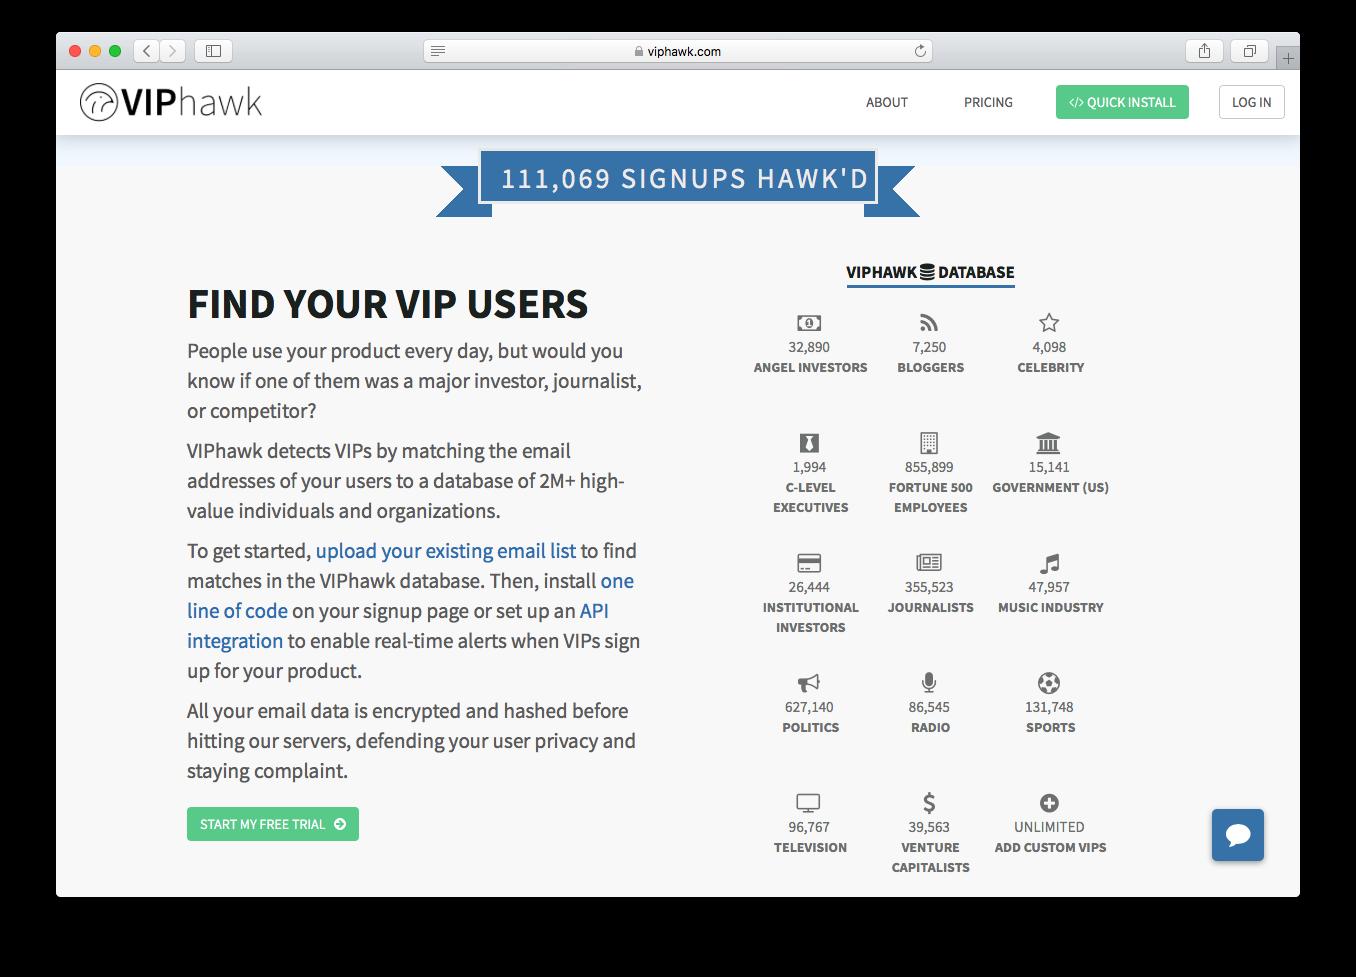 VIPhawk homepage screenshot